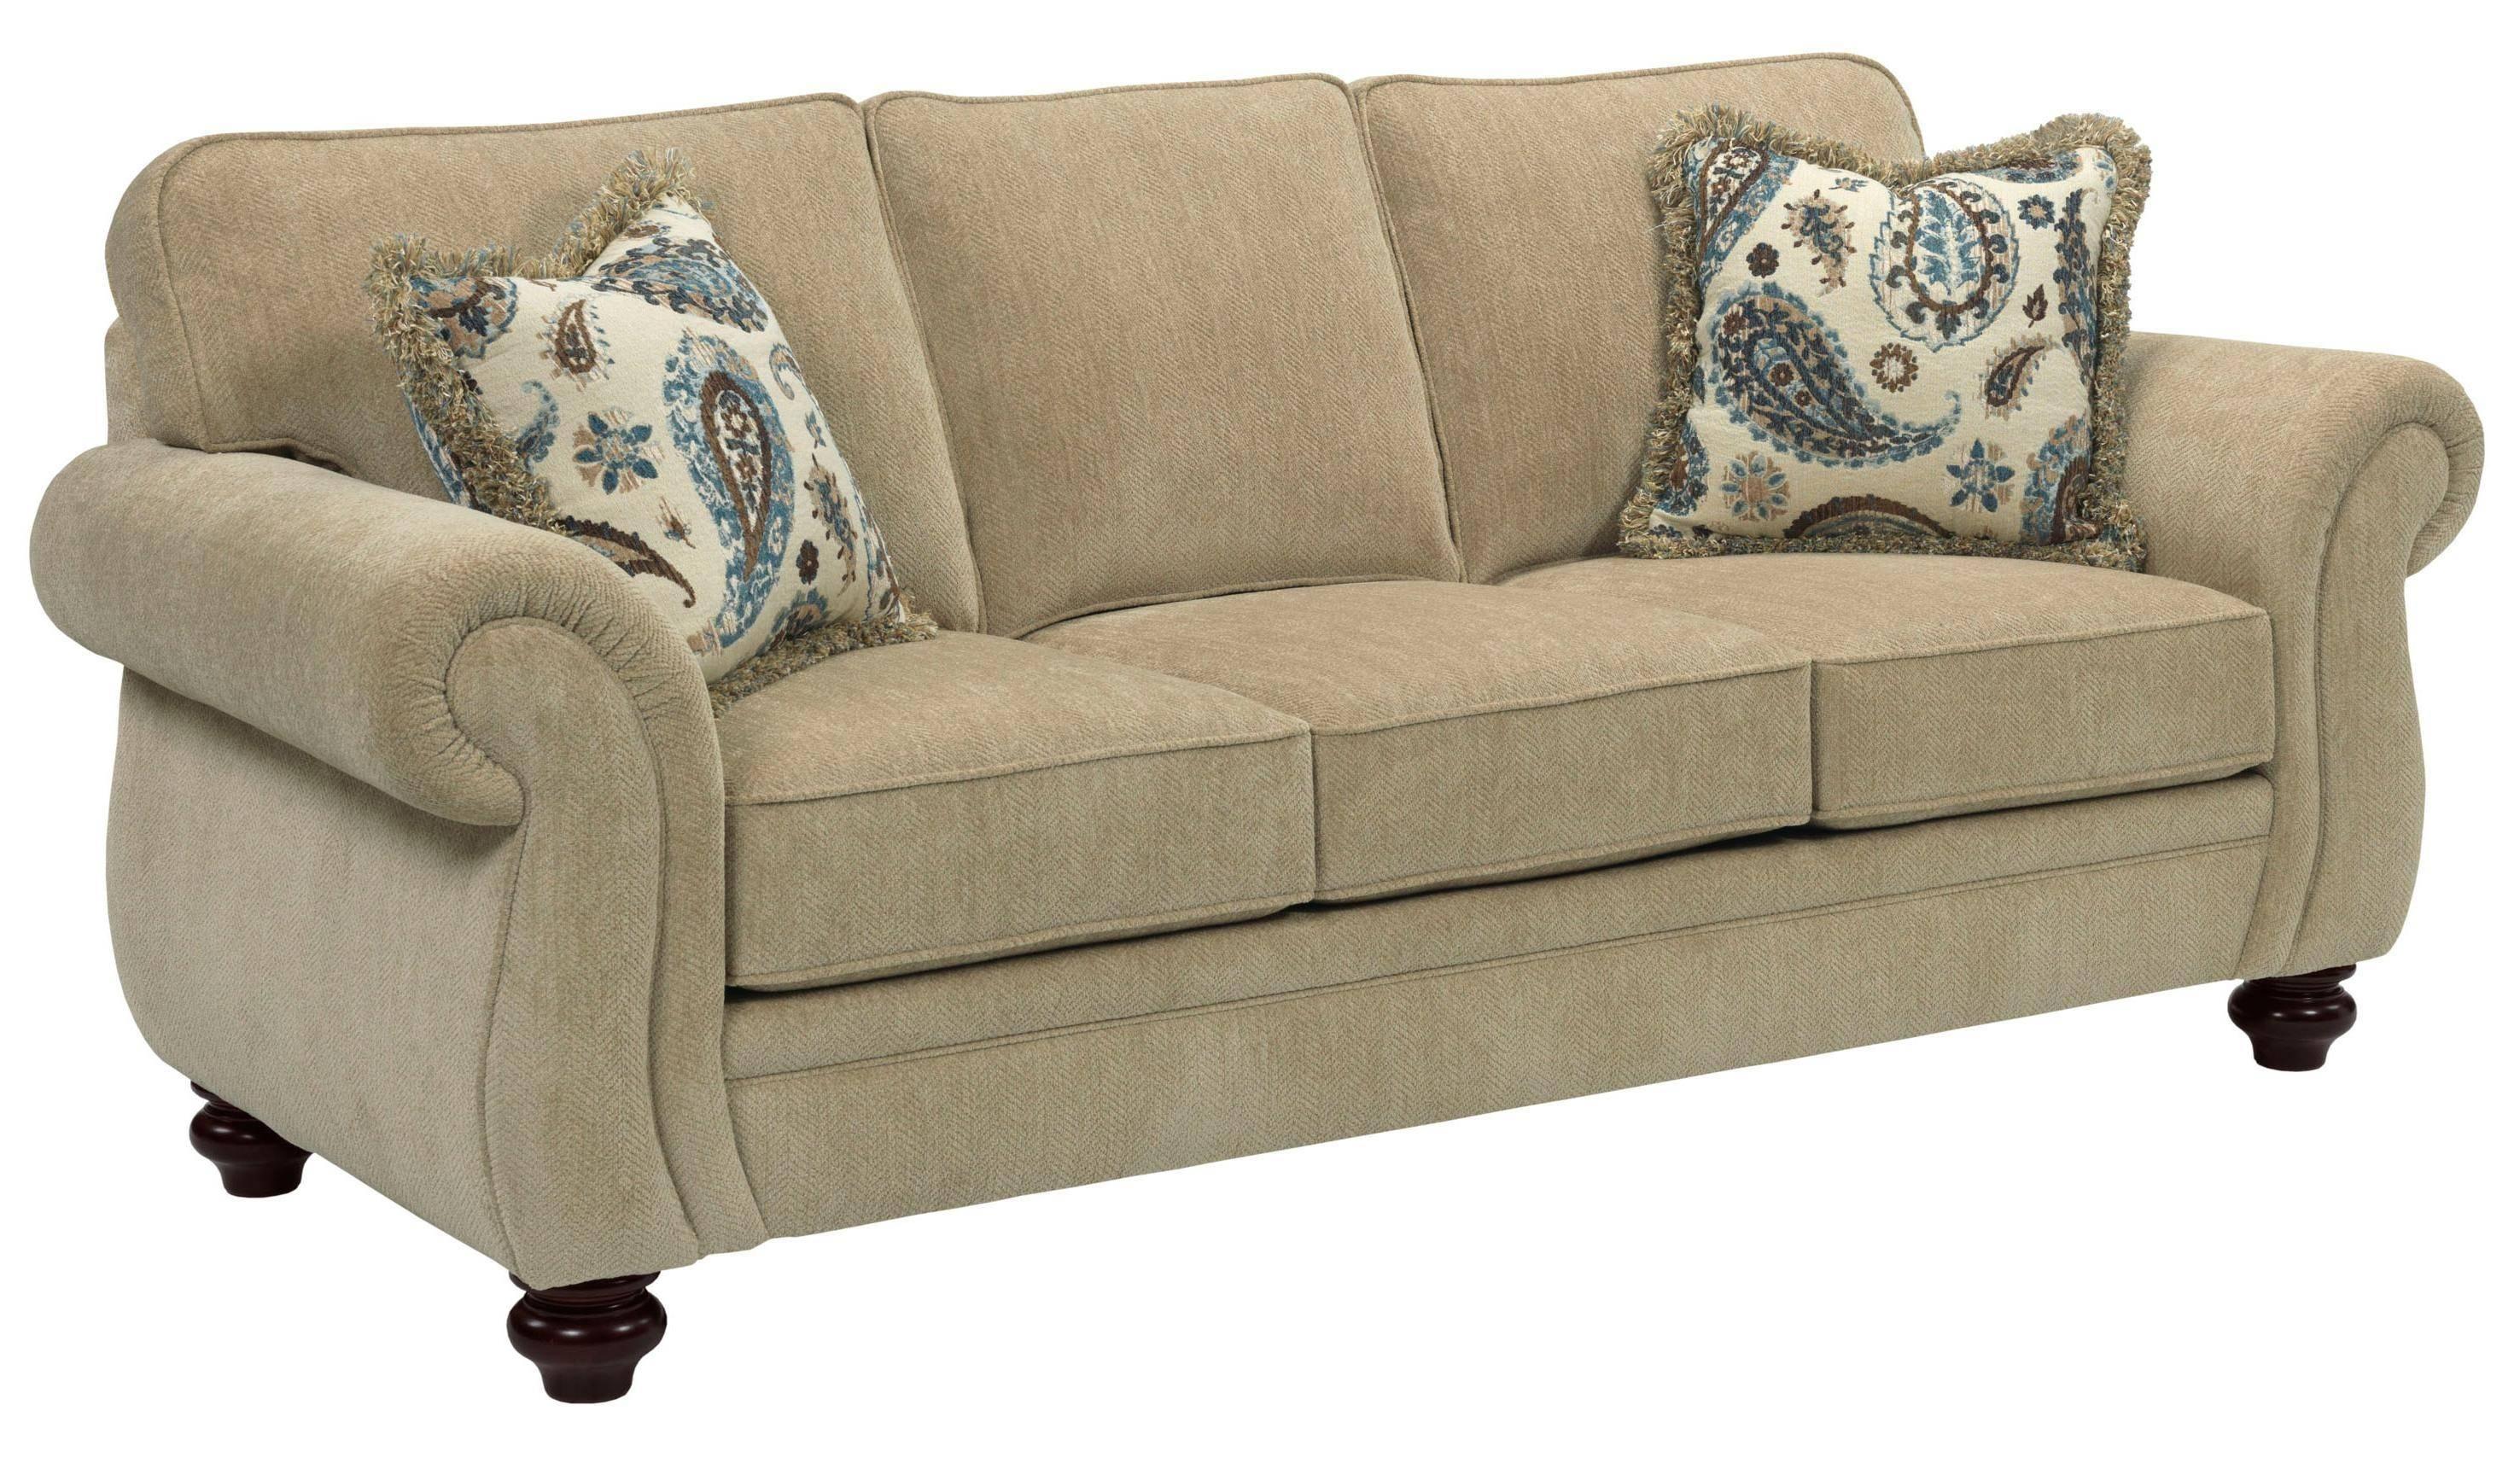 Sofa Ideas: Broyhill Harrison Sofas (Explore #5 Of 20 Photos) intended for Broyhill Harrison Sofas (Image 14 of 15)